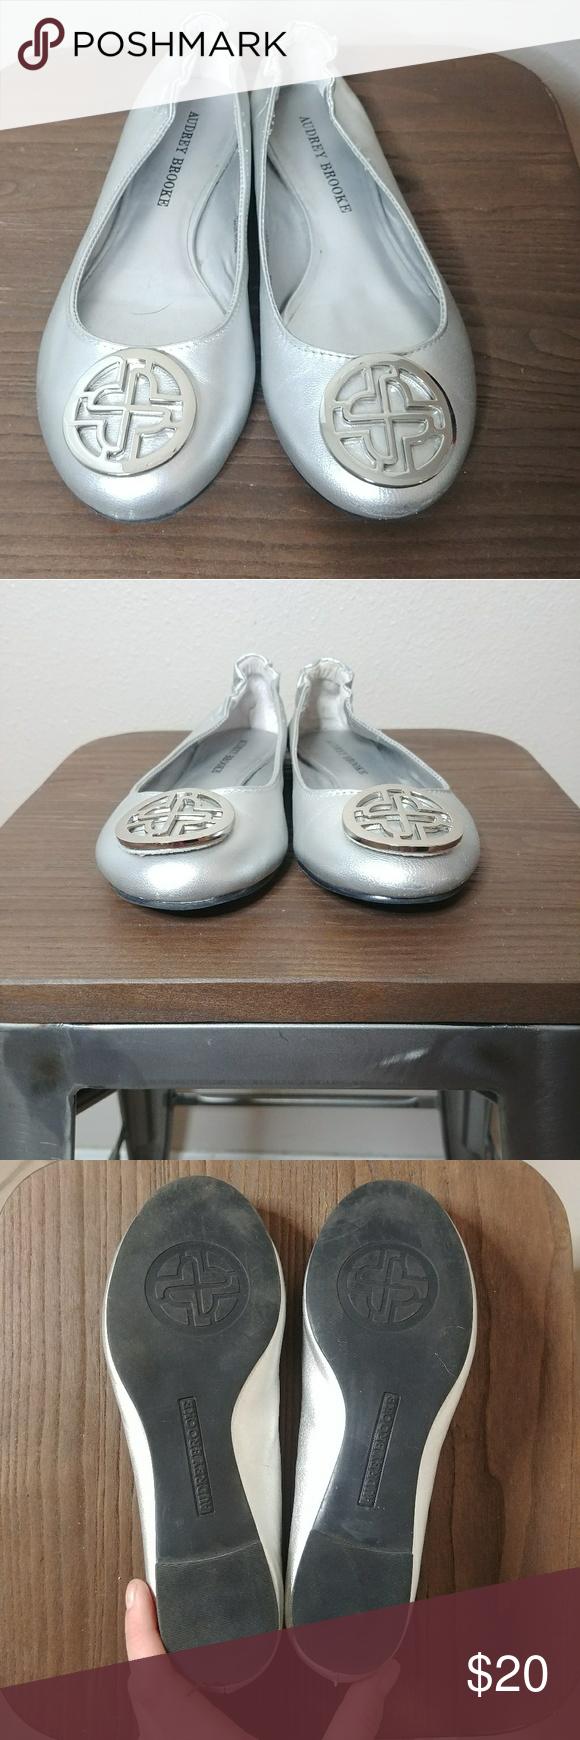 ff4a41e84def Audrey Brooke Paris Ballet Flats Silver 6 Audrey Brooke Paris Ballet Flats  Silver Size 6 Preowned